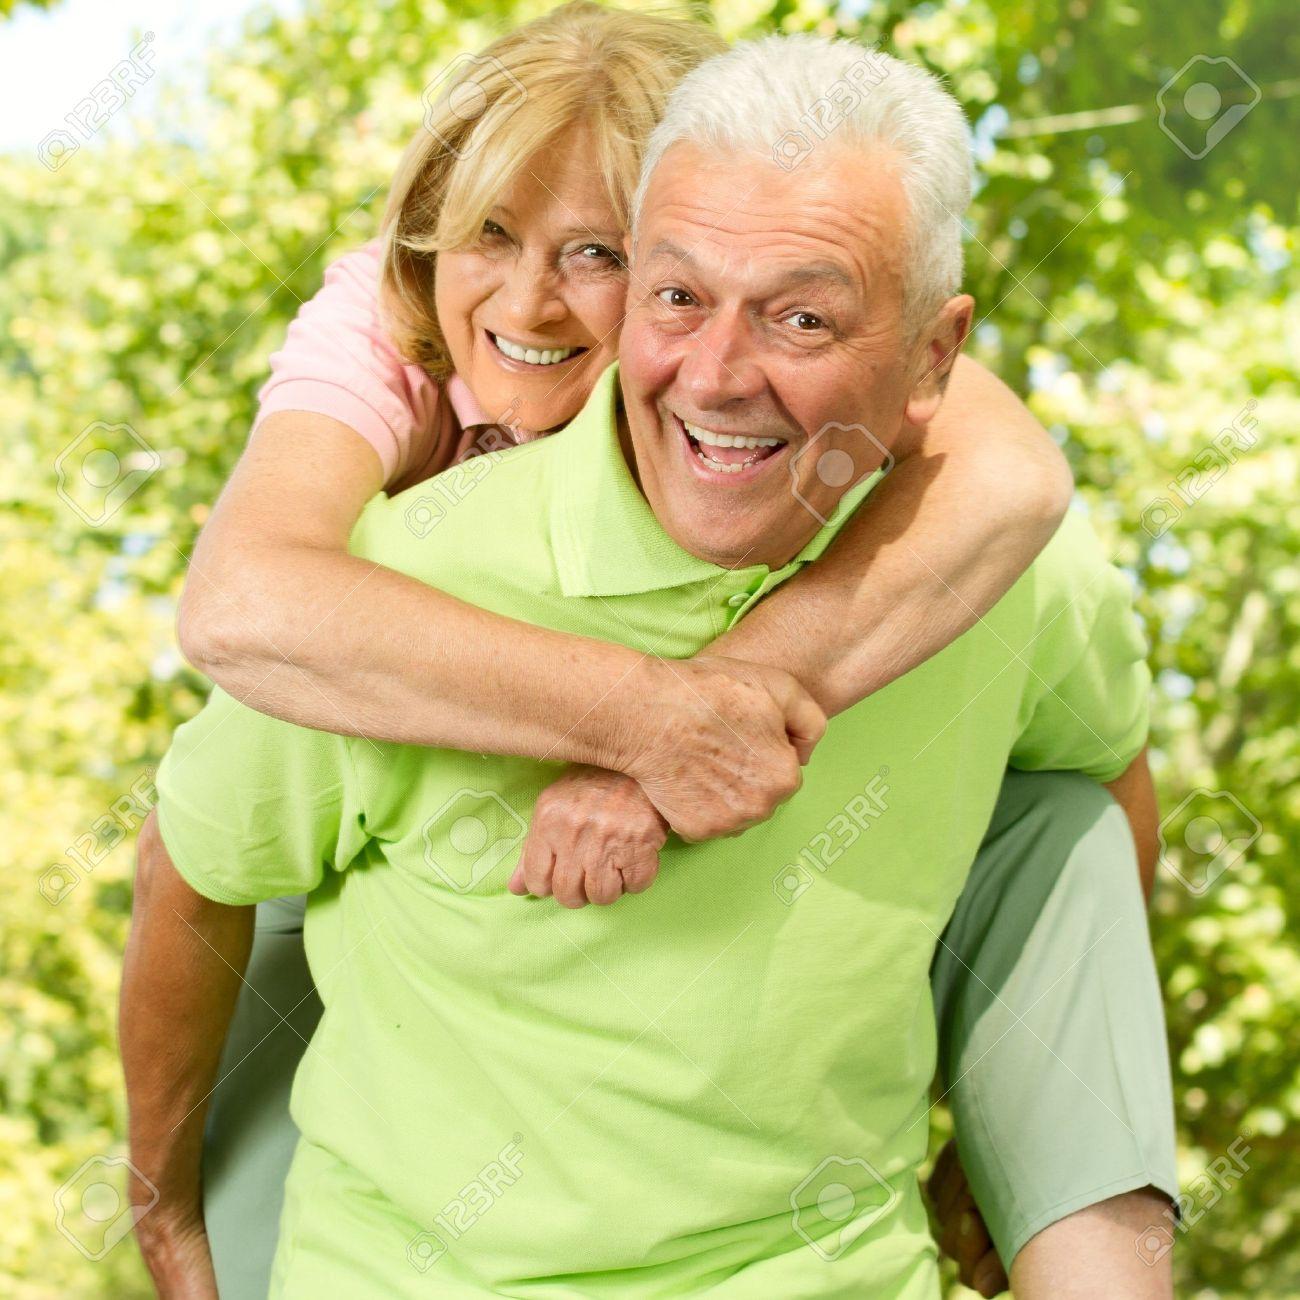 Portrait of happy senior man giving piggyback ride outdoors. - 10760283